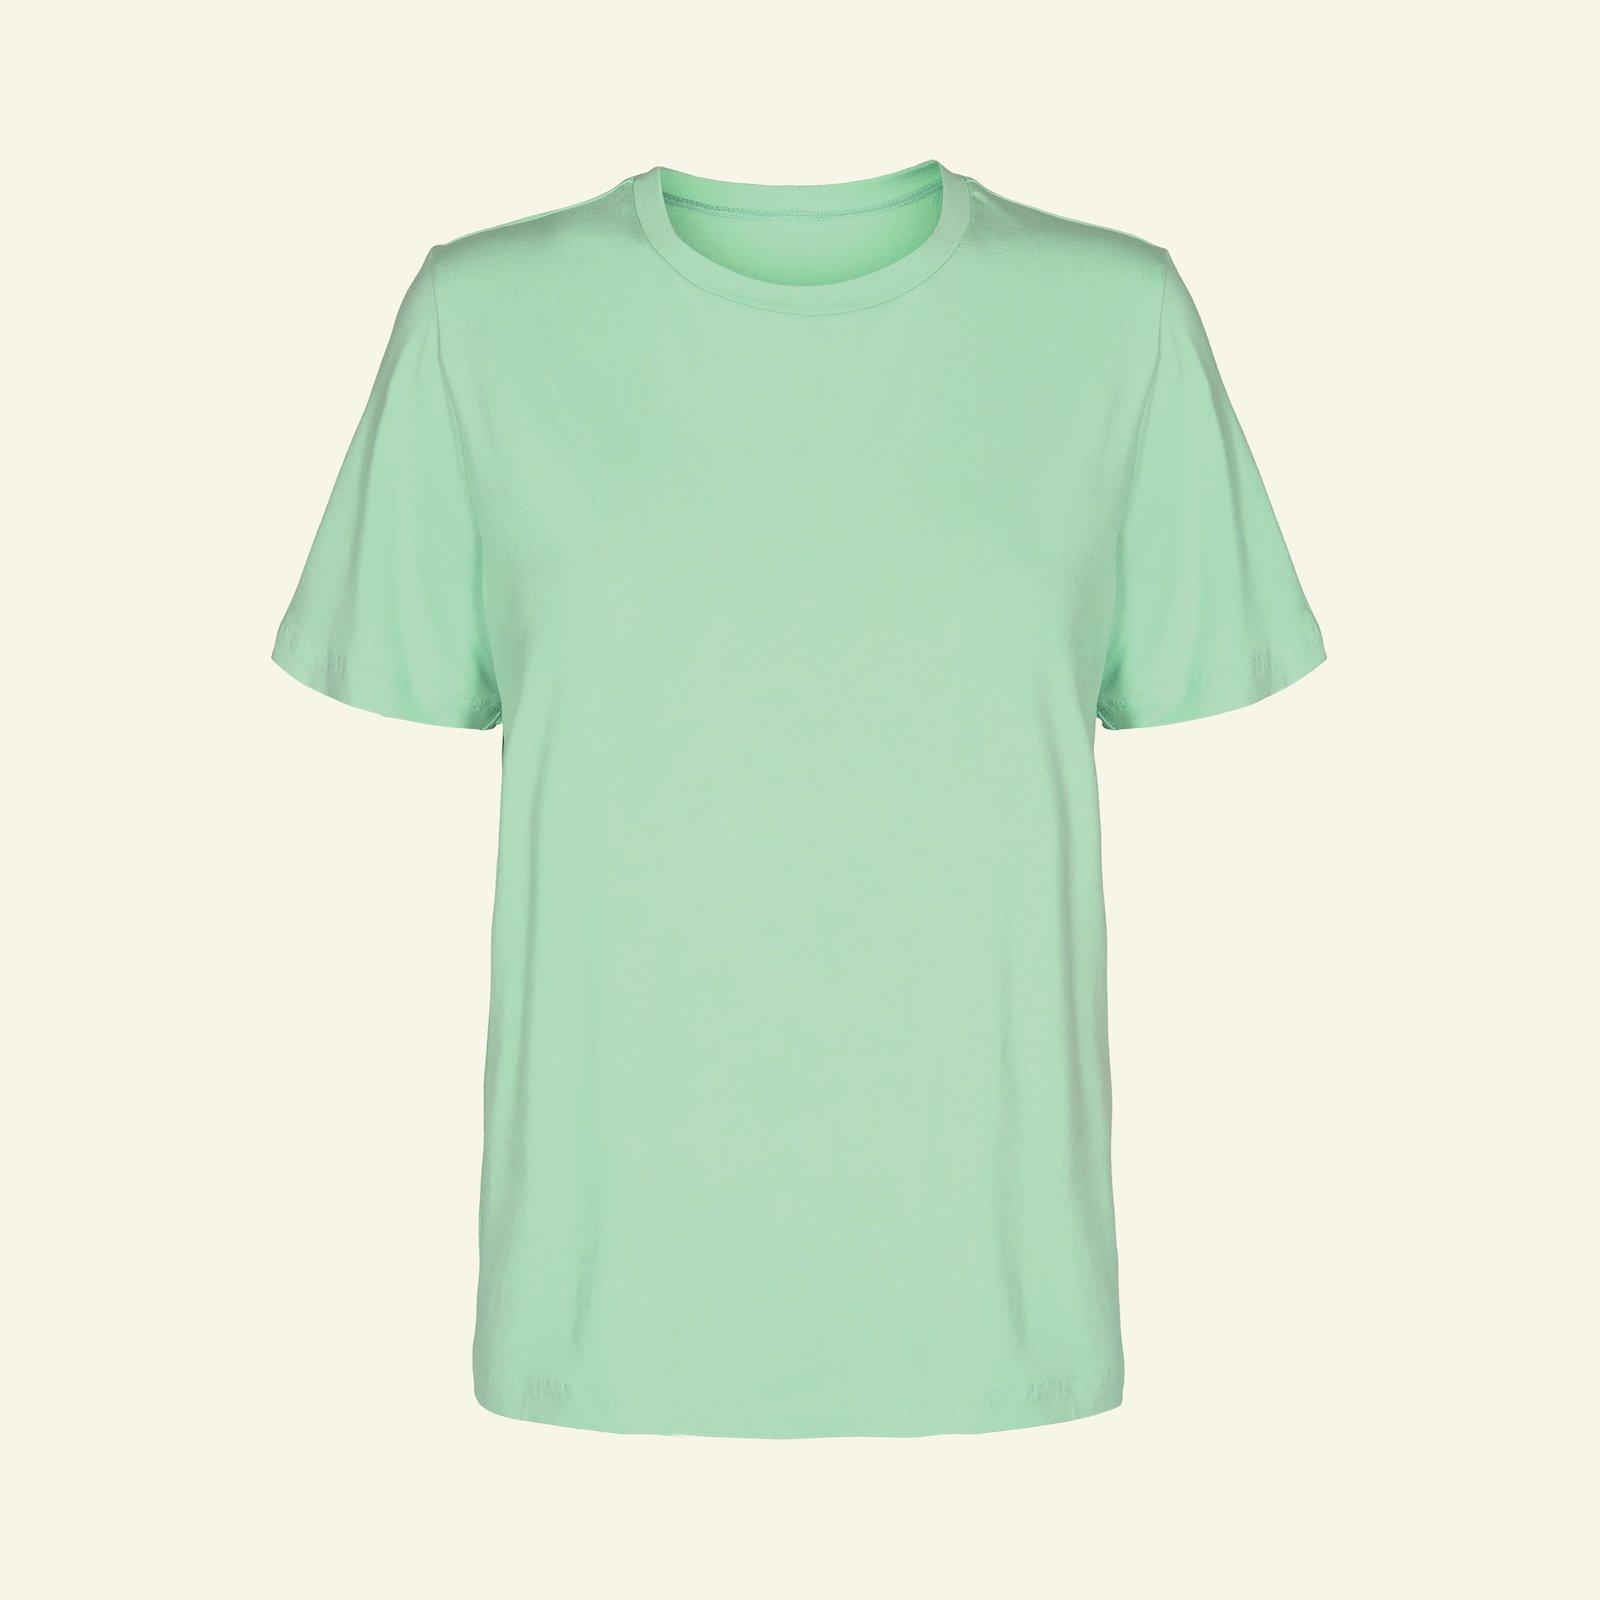 T-shirt and dress, 40/12 p22070_272660_sskit